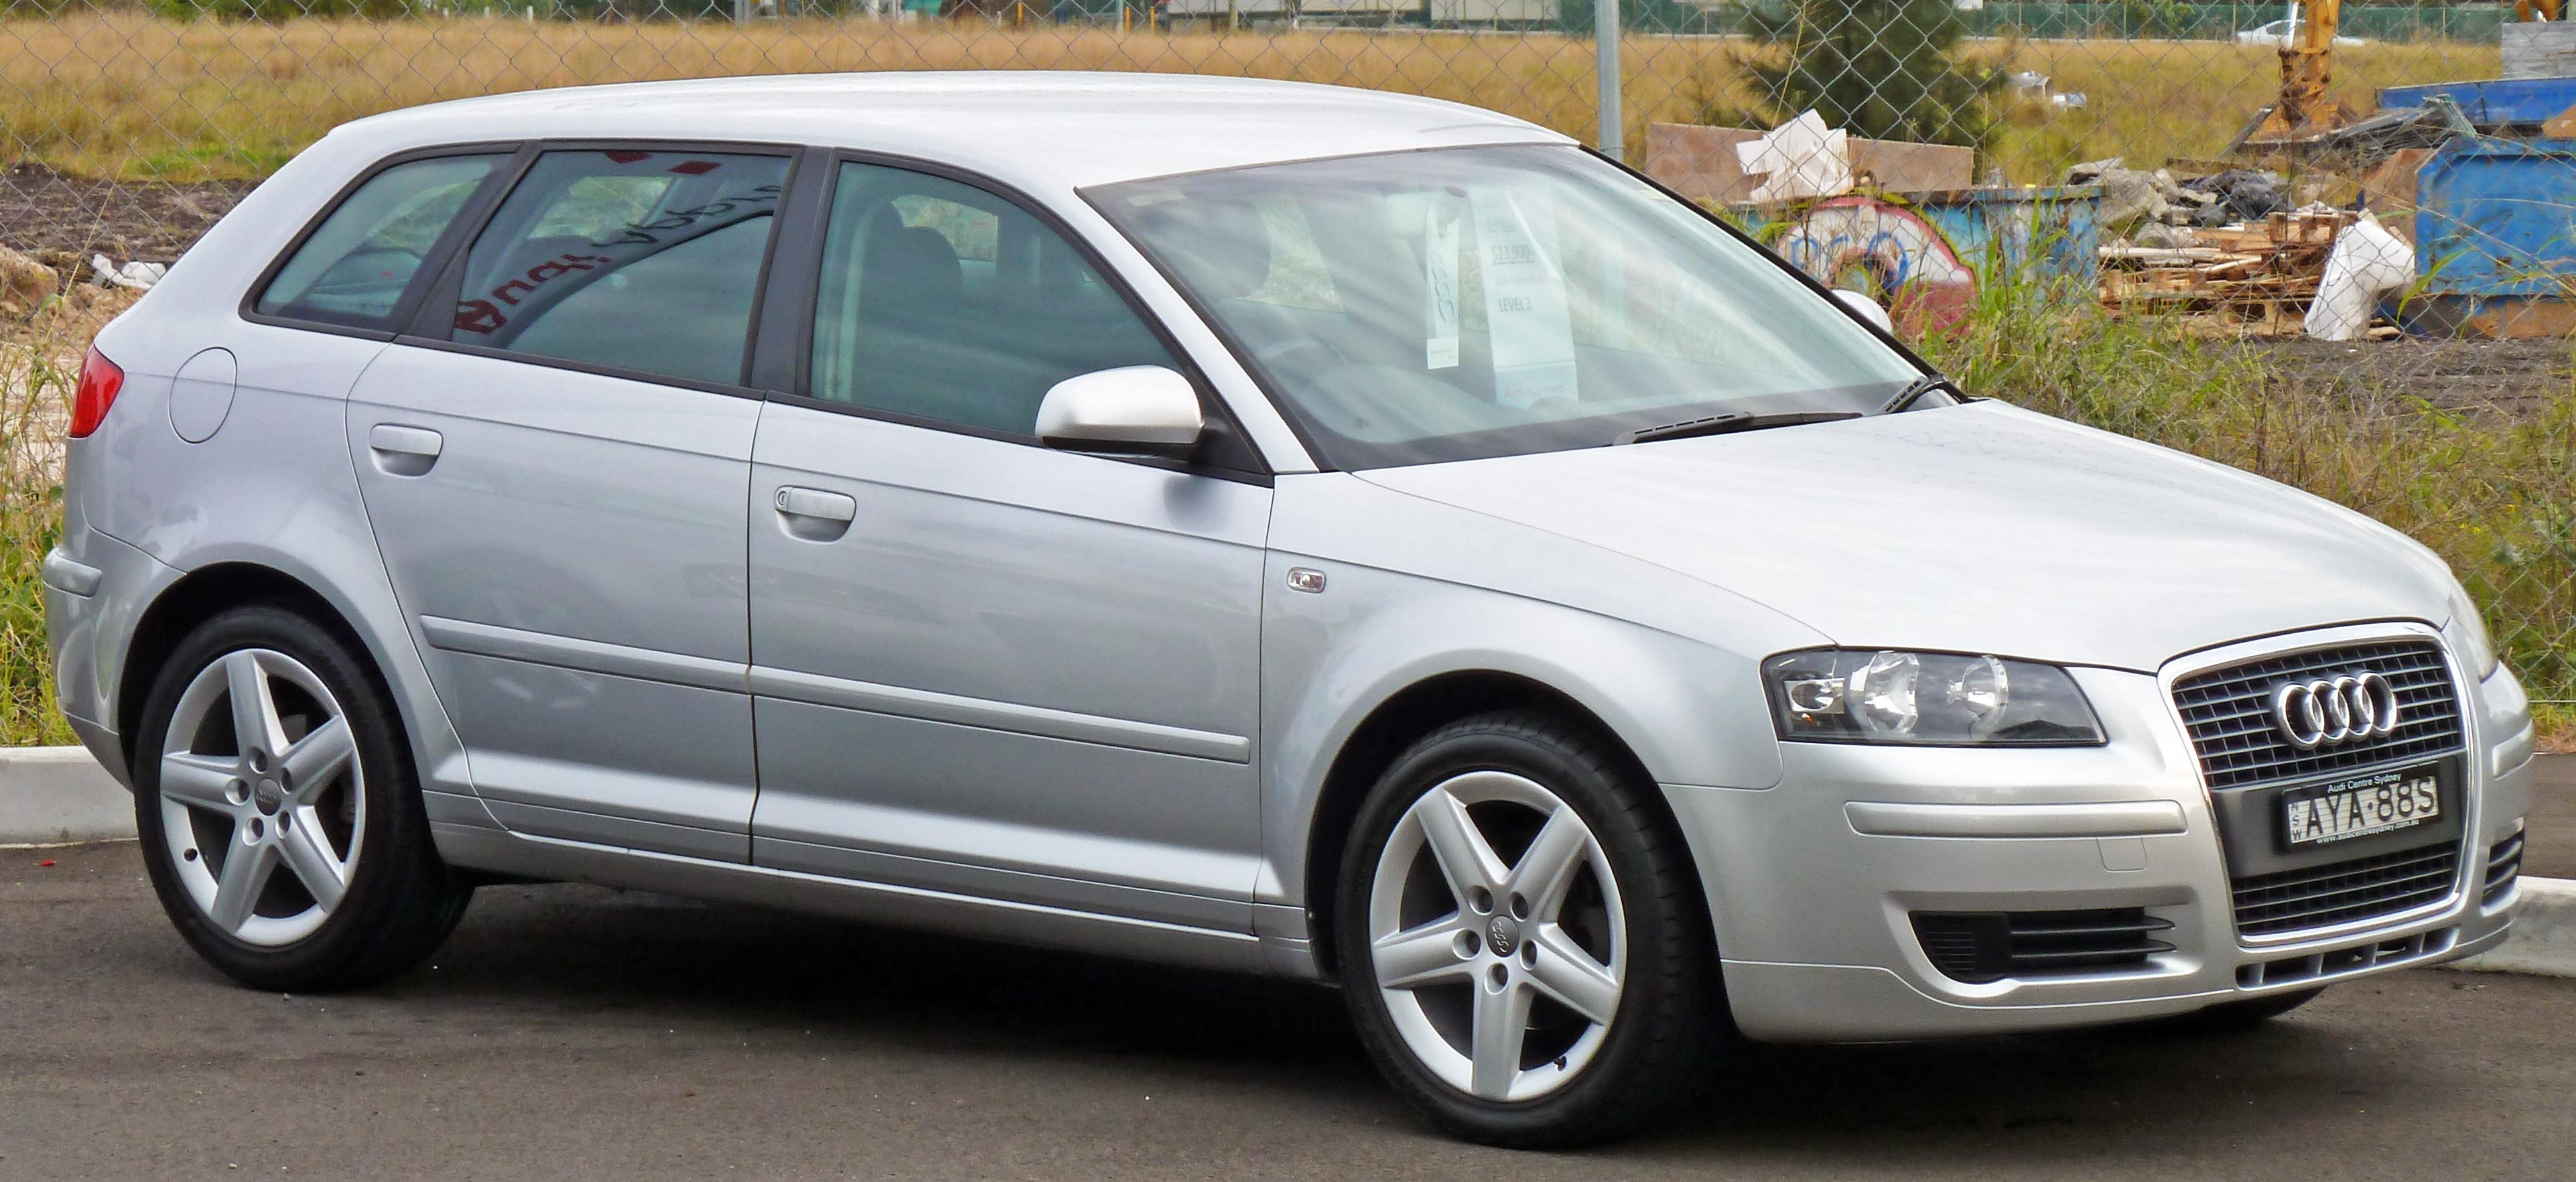 Audi A3 2005